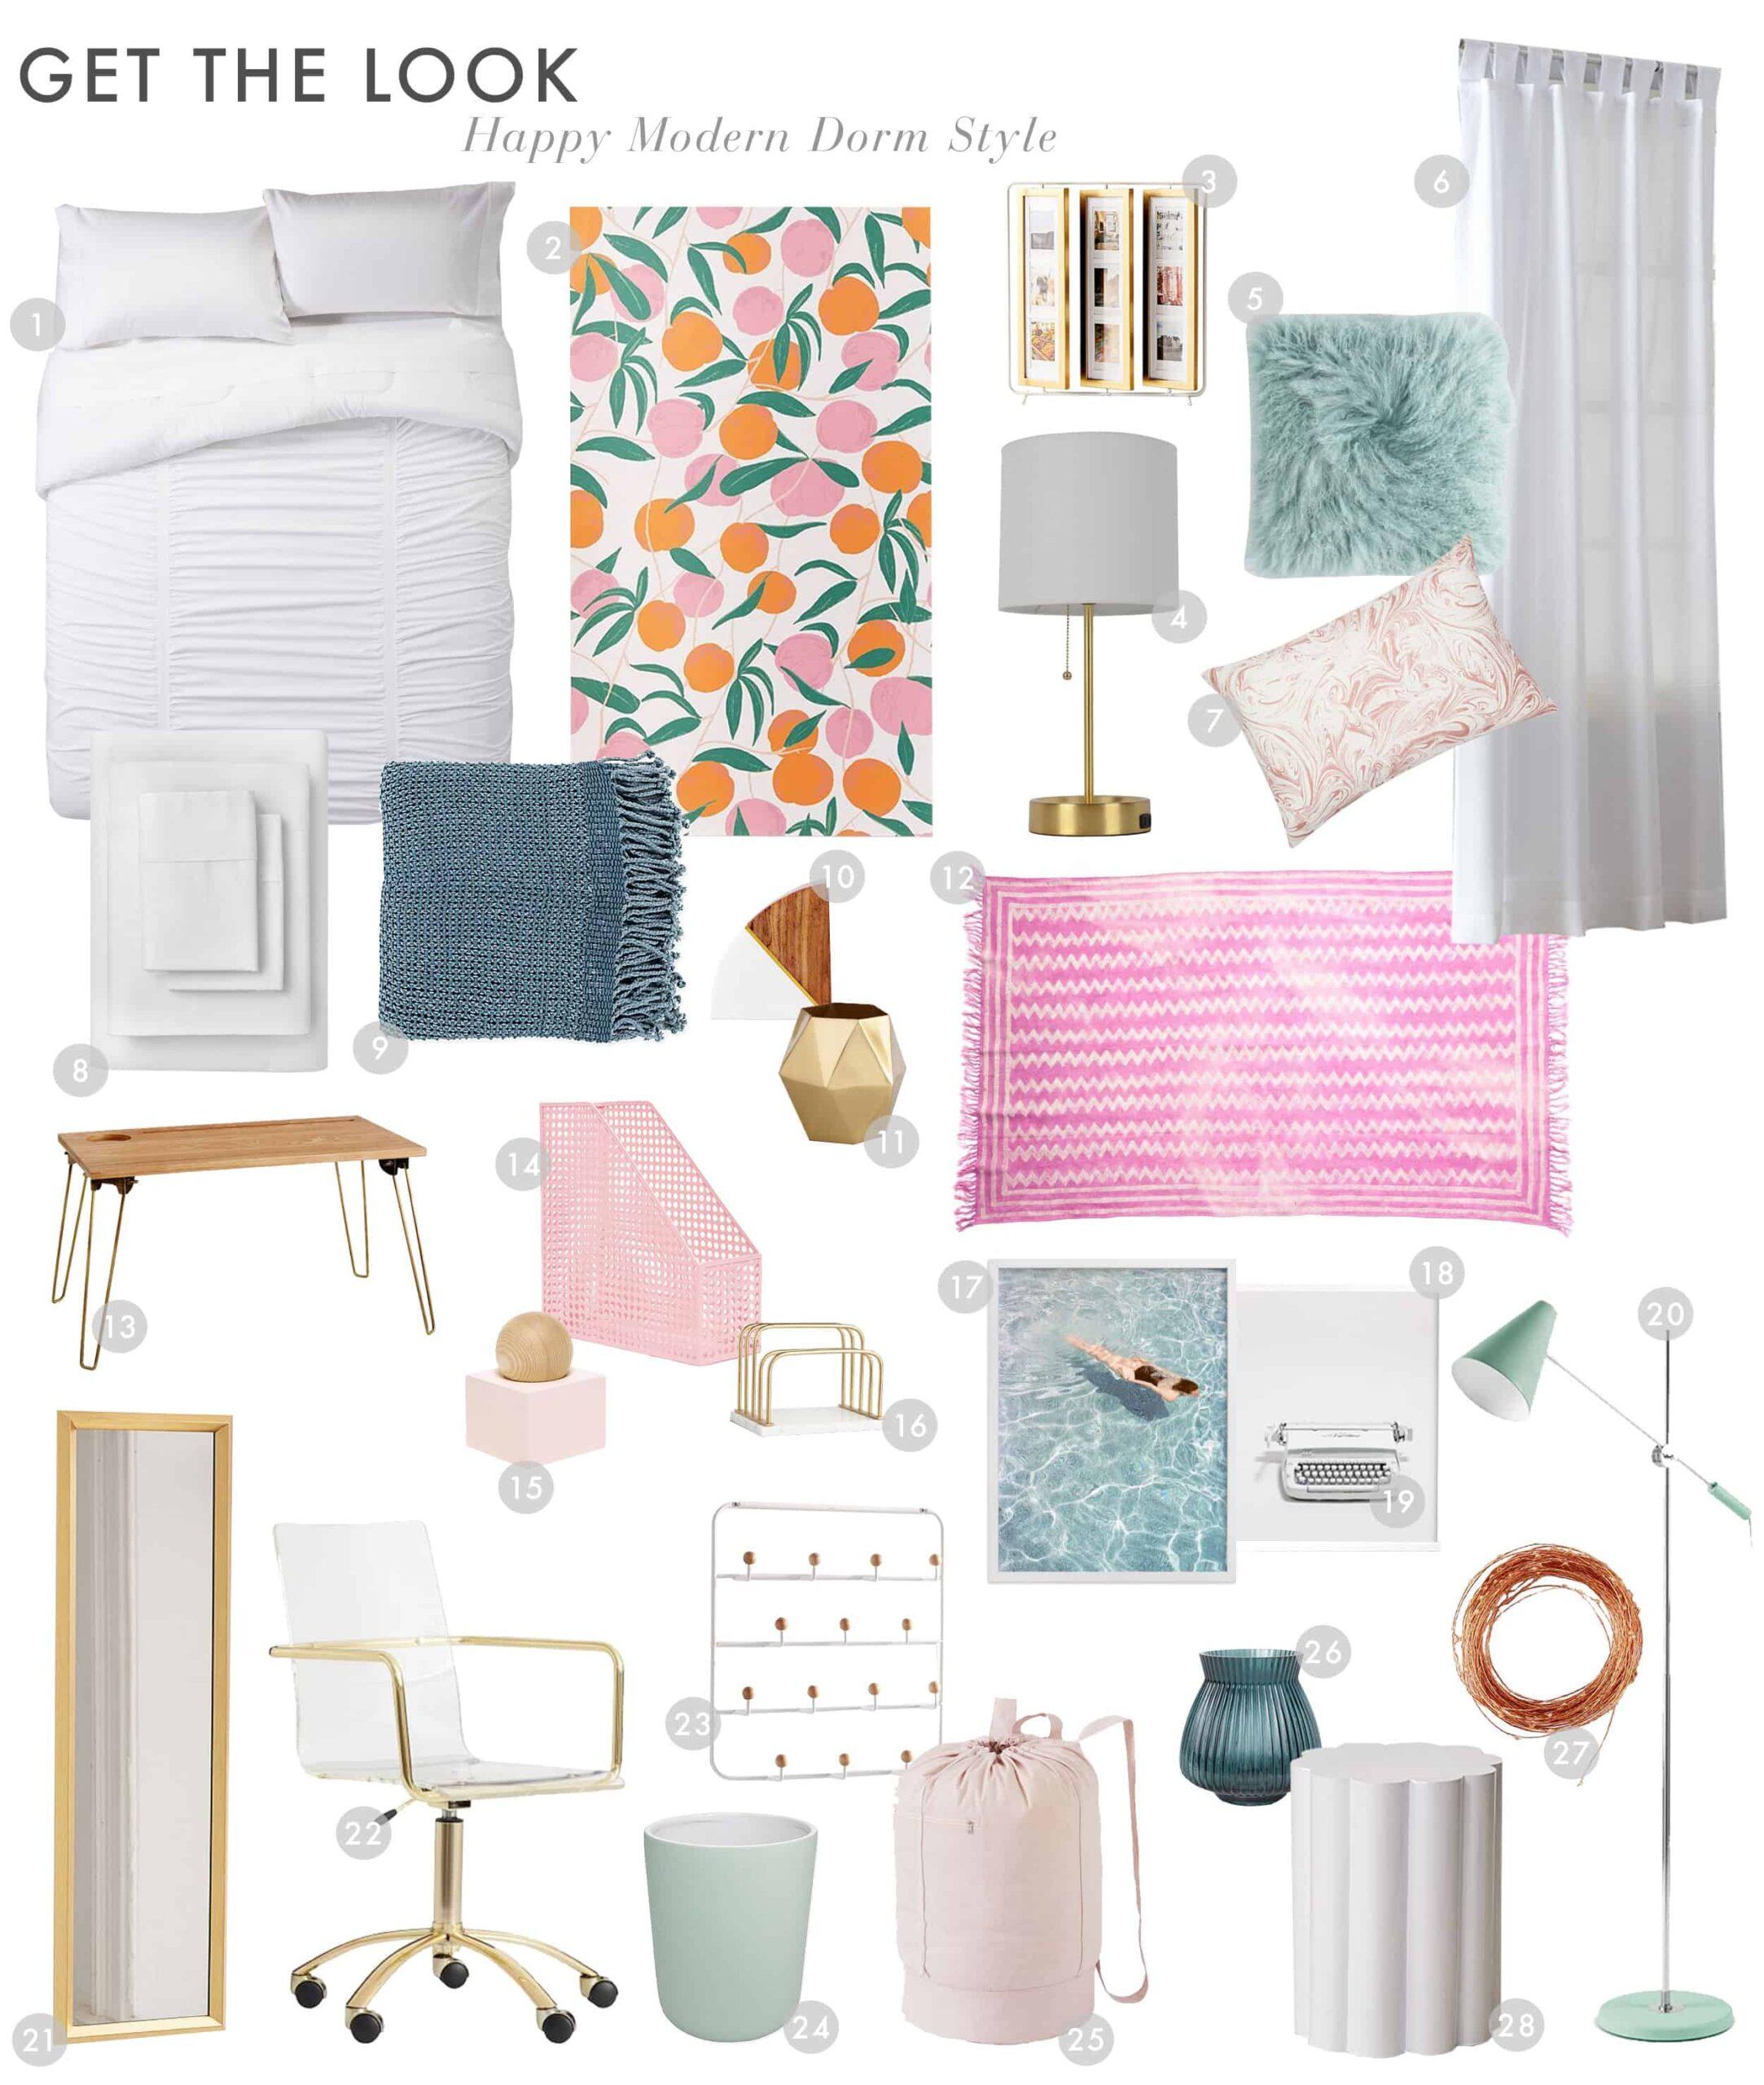 Dorm Room Happy Modern1